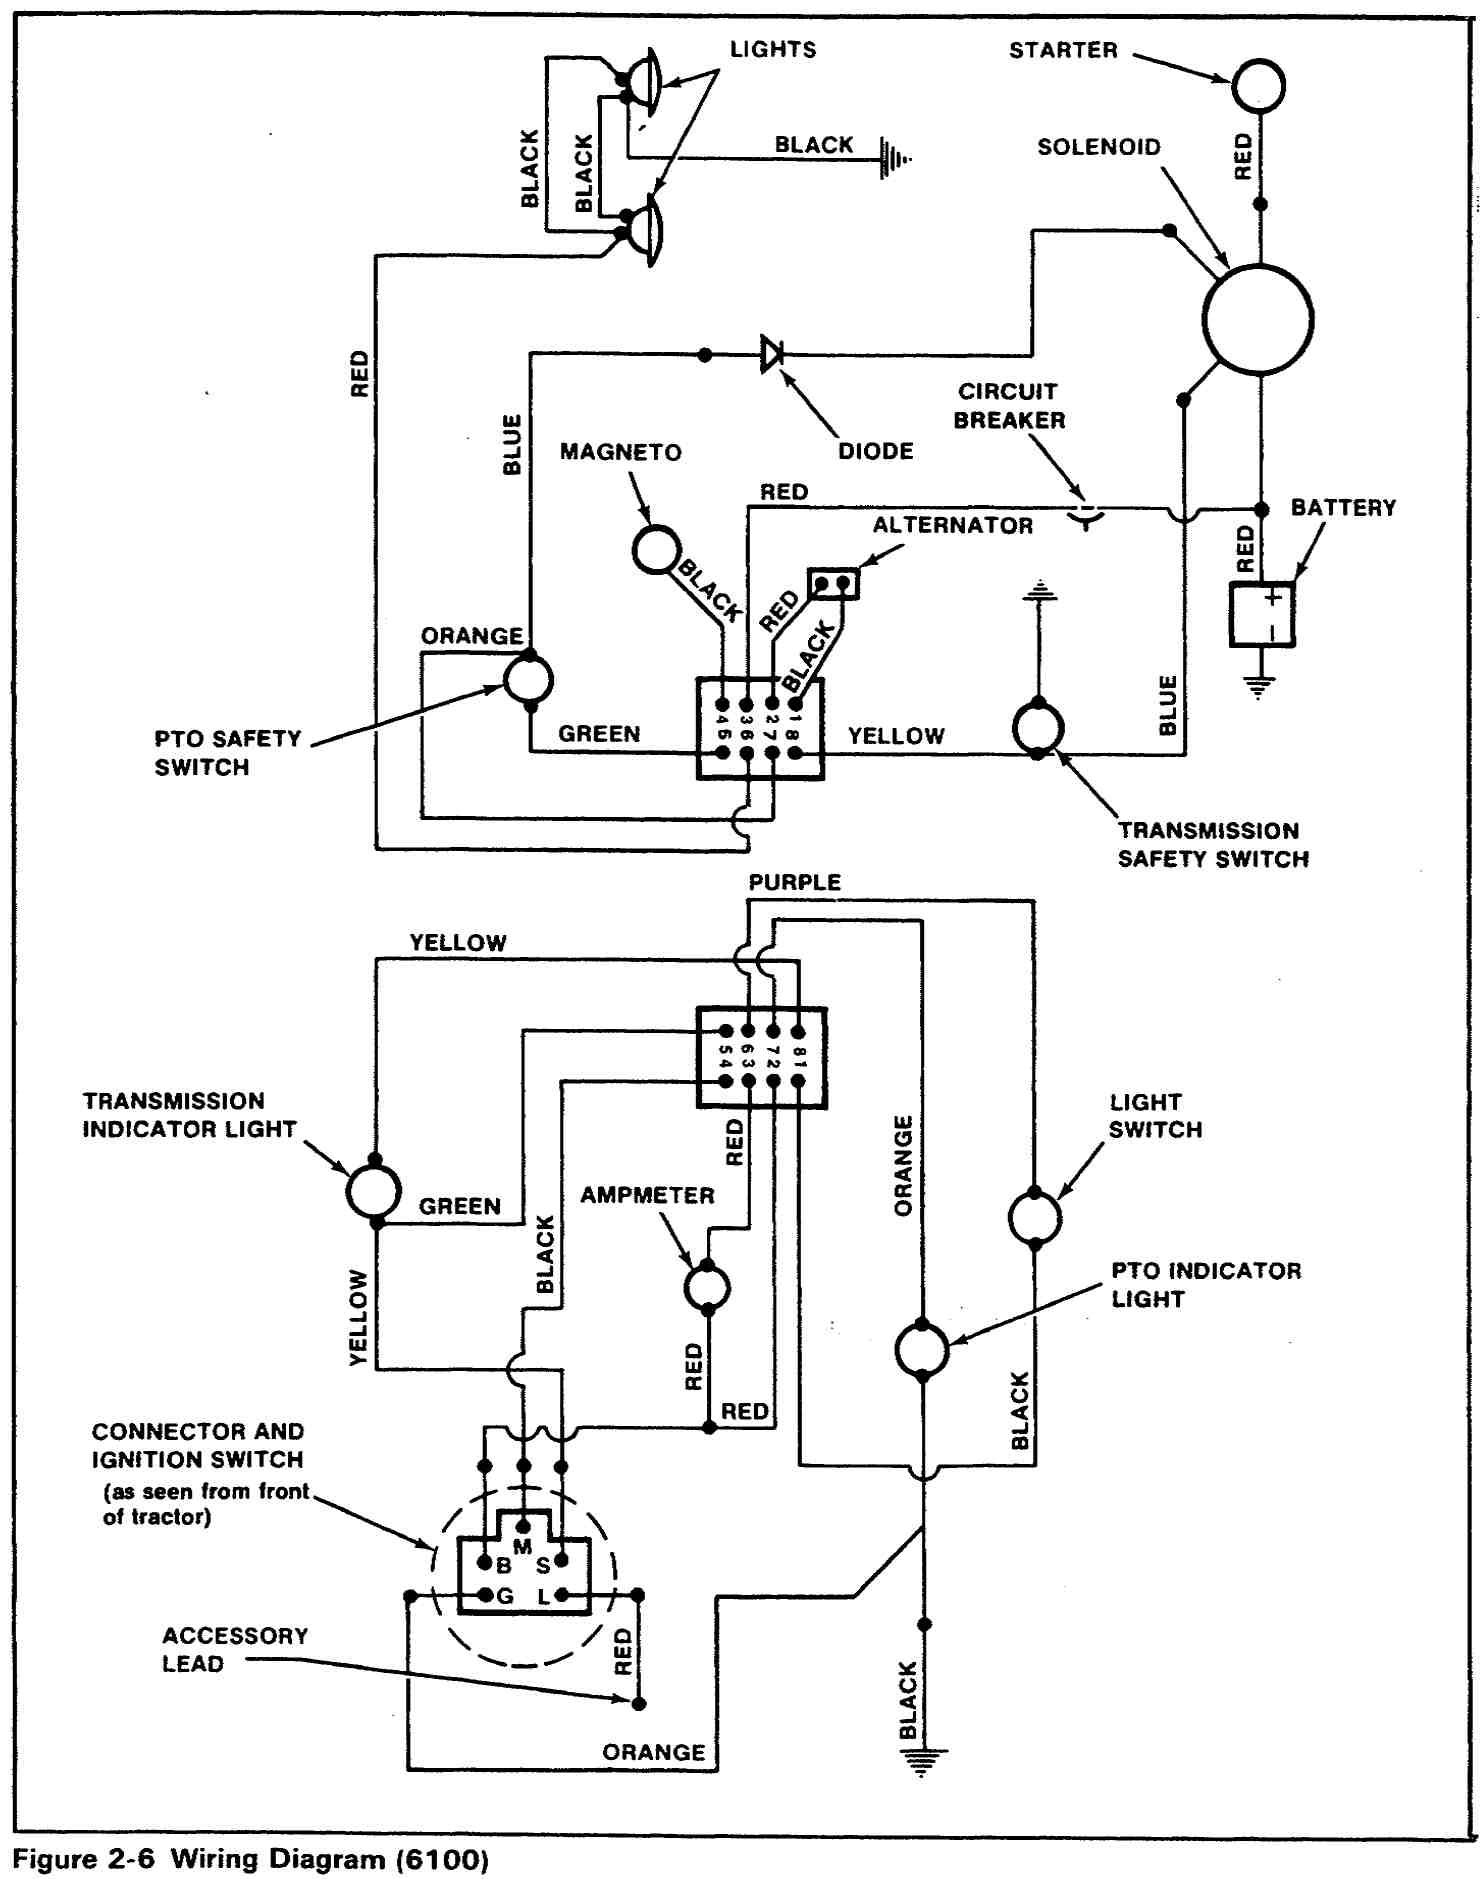 simplicity mower wiring diagram simplicity wiring diagrams wiring diagram data  simplicity wiring diagrams wiring